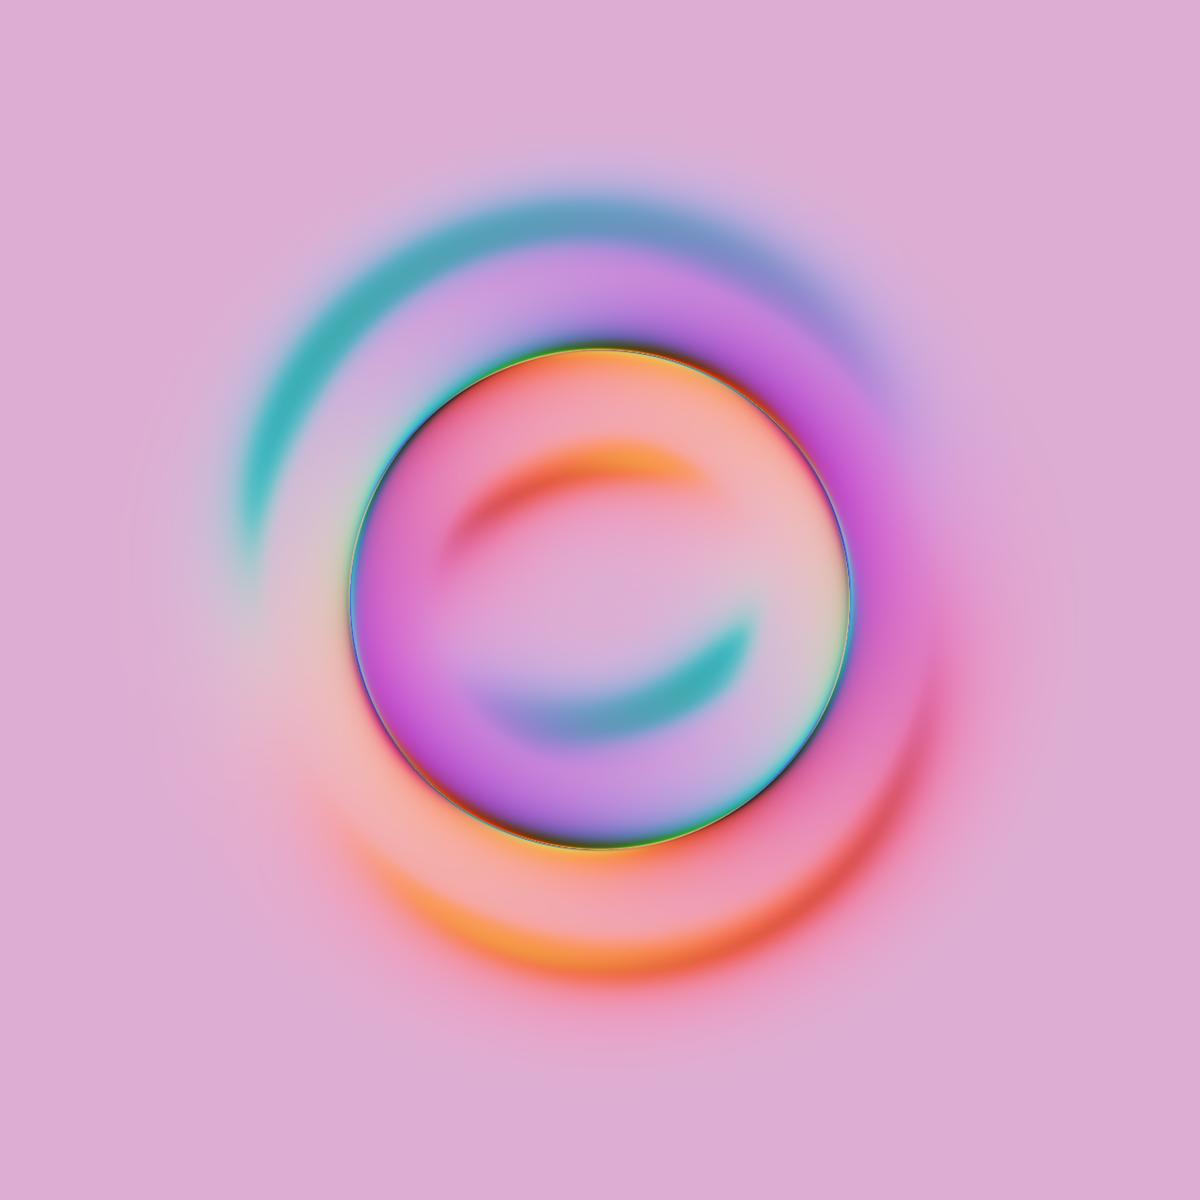 Image may contain: colorfulness, circle and close-up